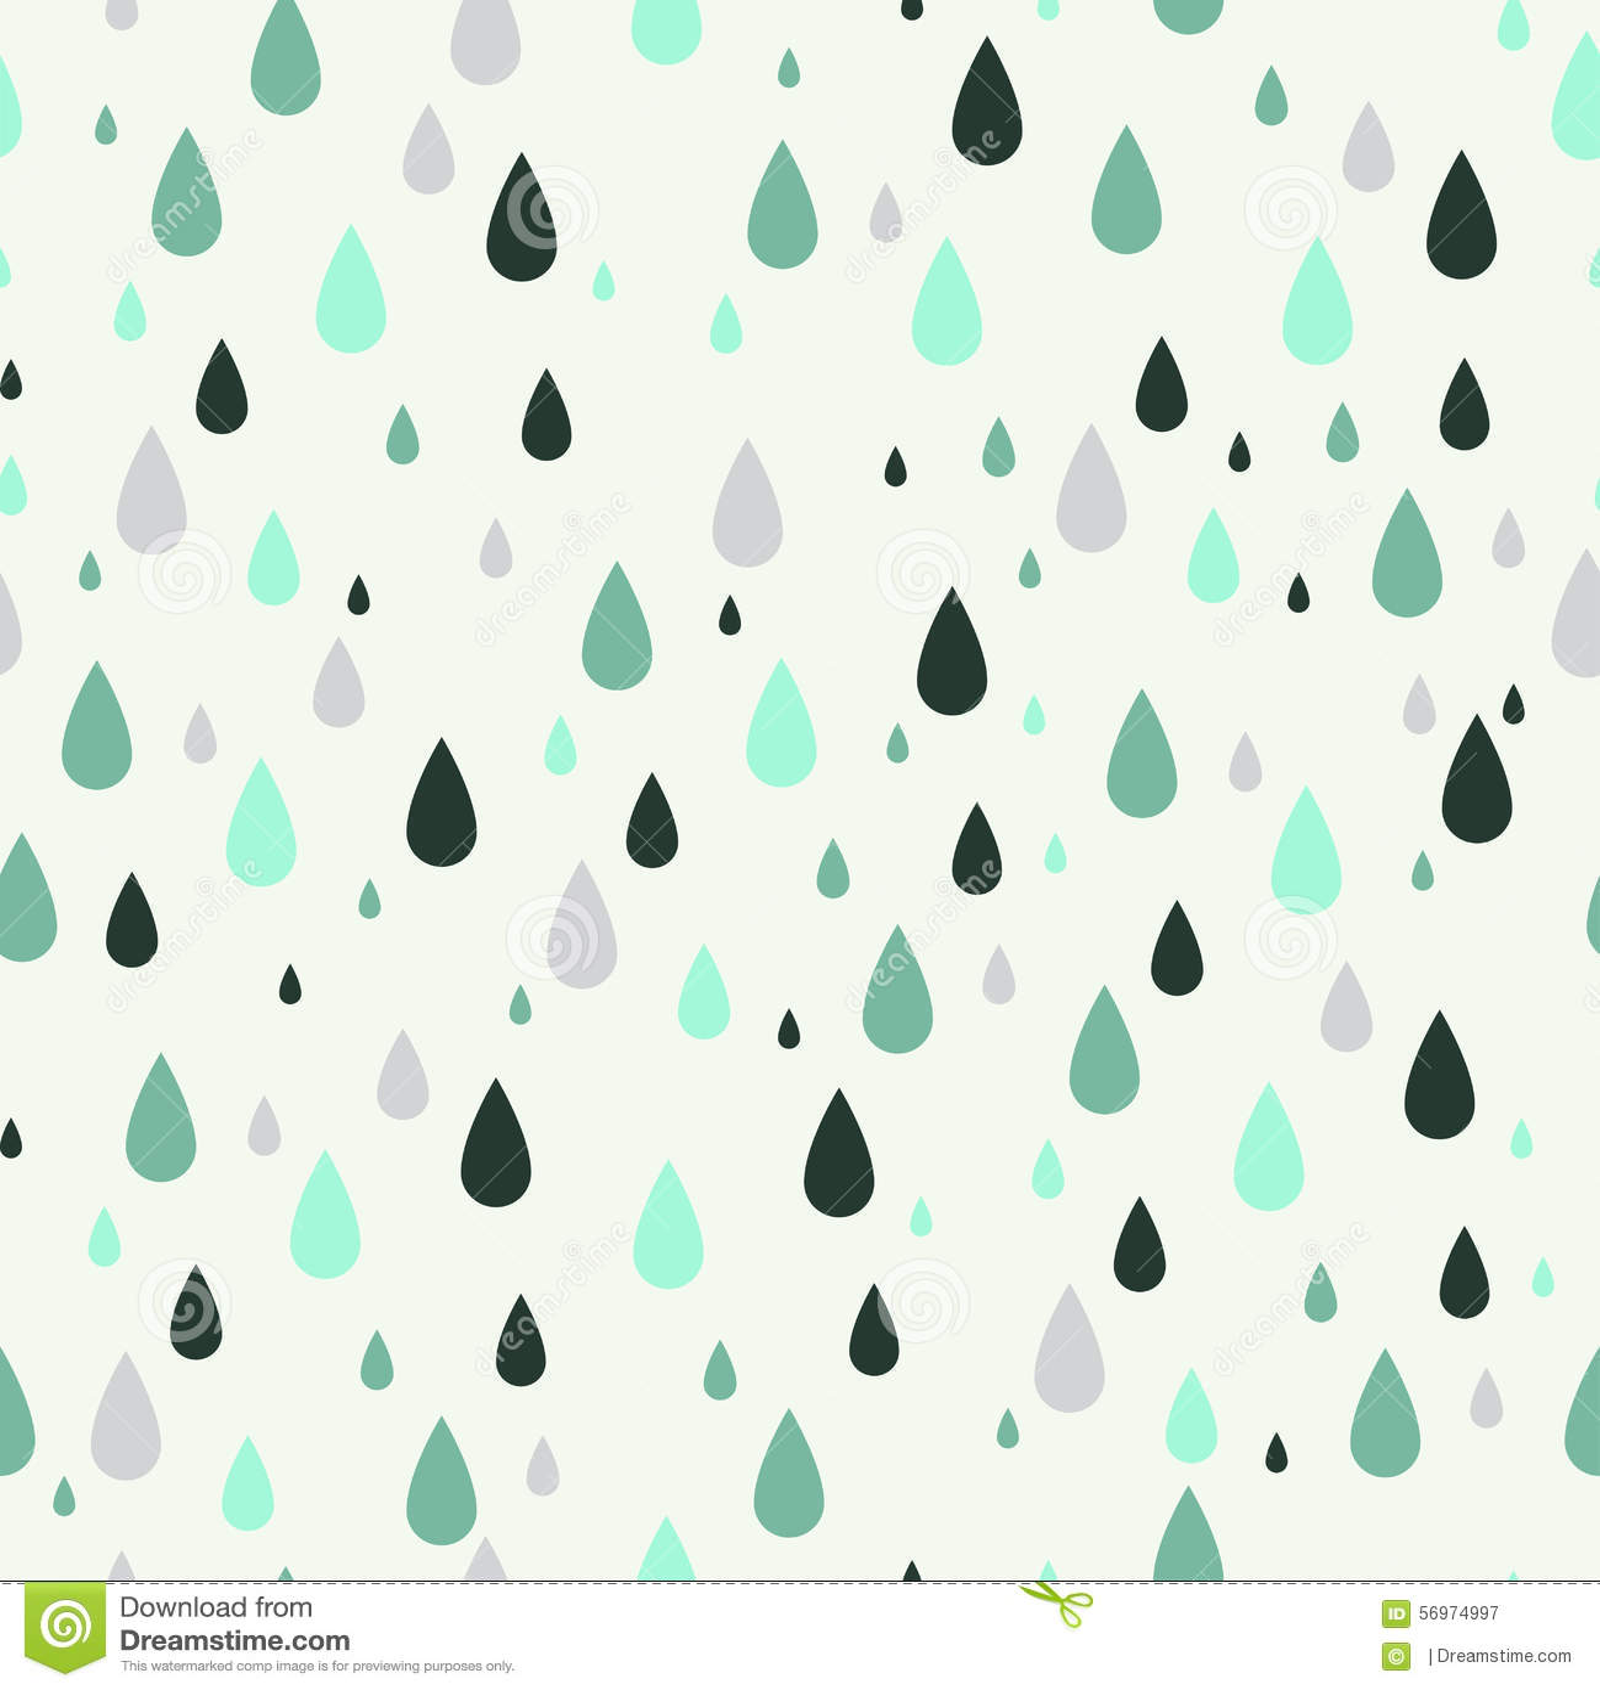 Drops Patterns Interesting Decoration